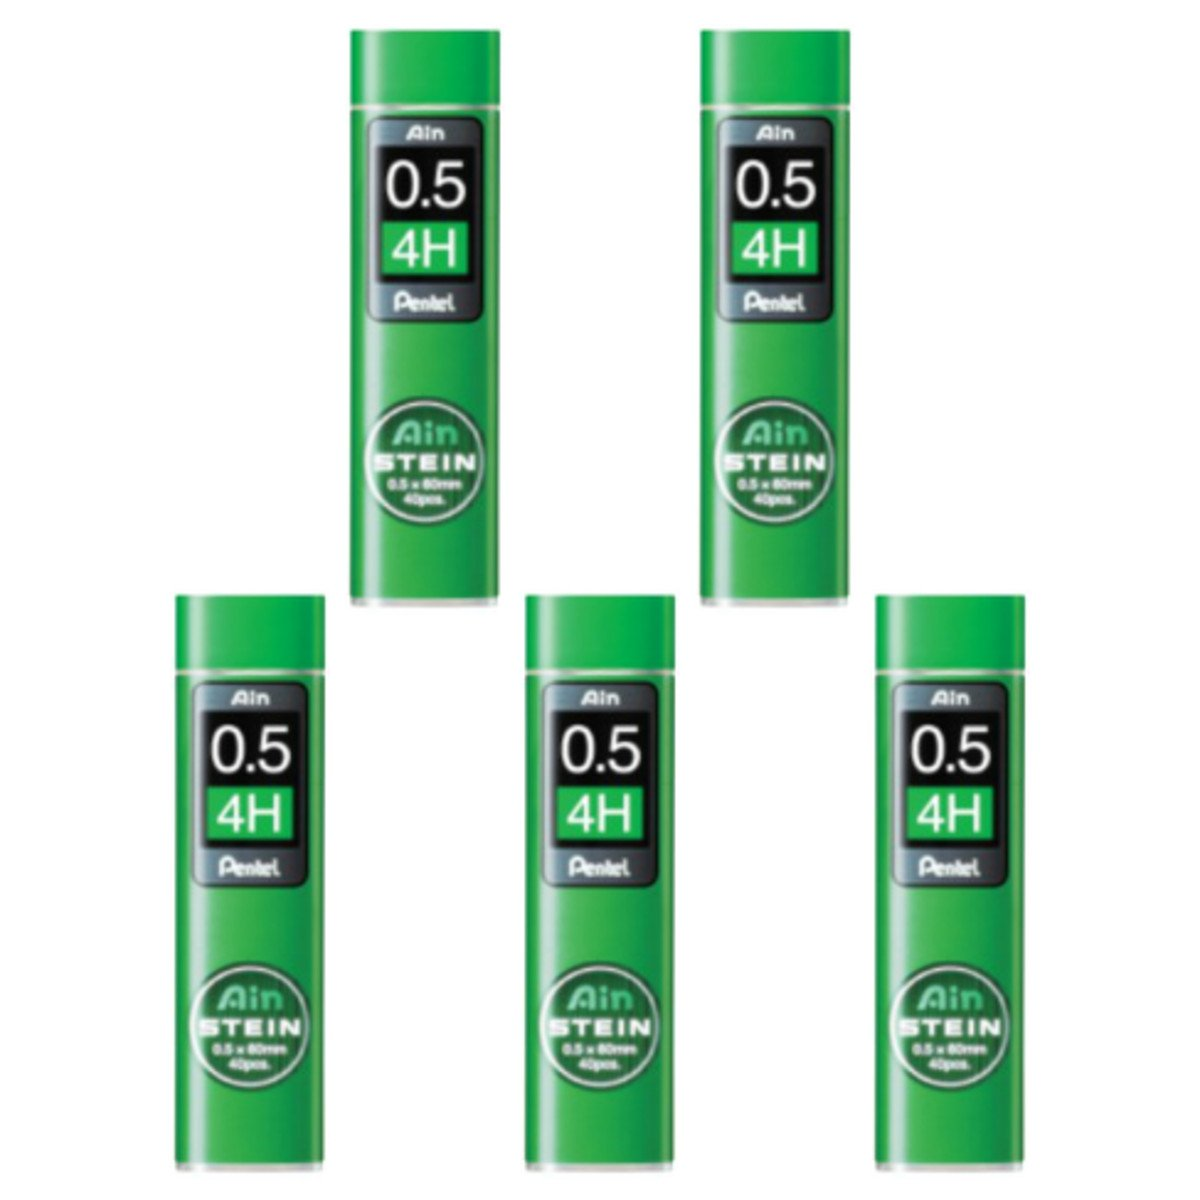 Pentel Ain Mechanical Pencil Leads 0.5mm 4H, 5 Pack/total 200 Leads Value Set